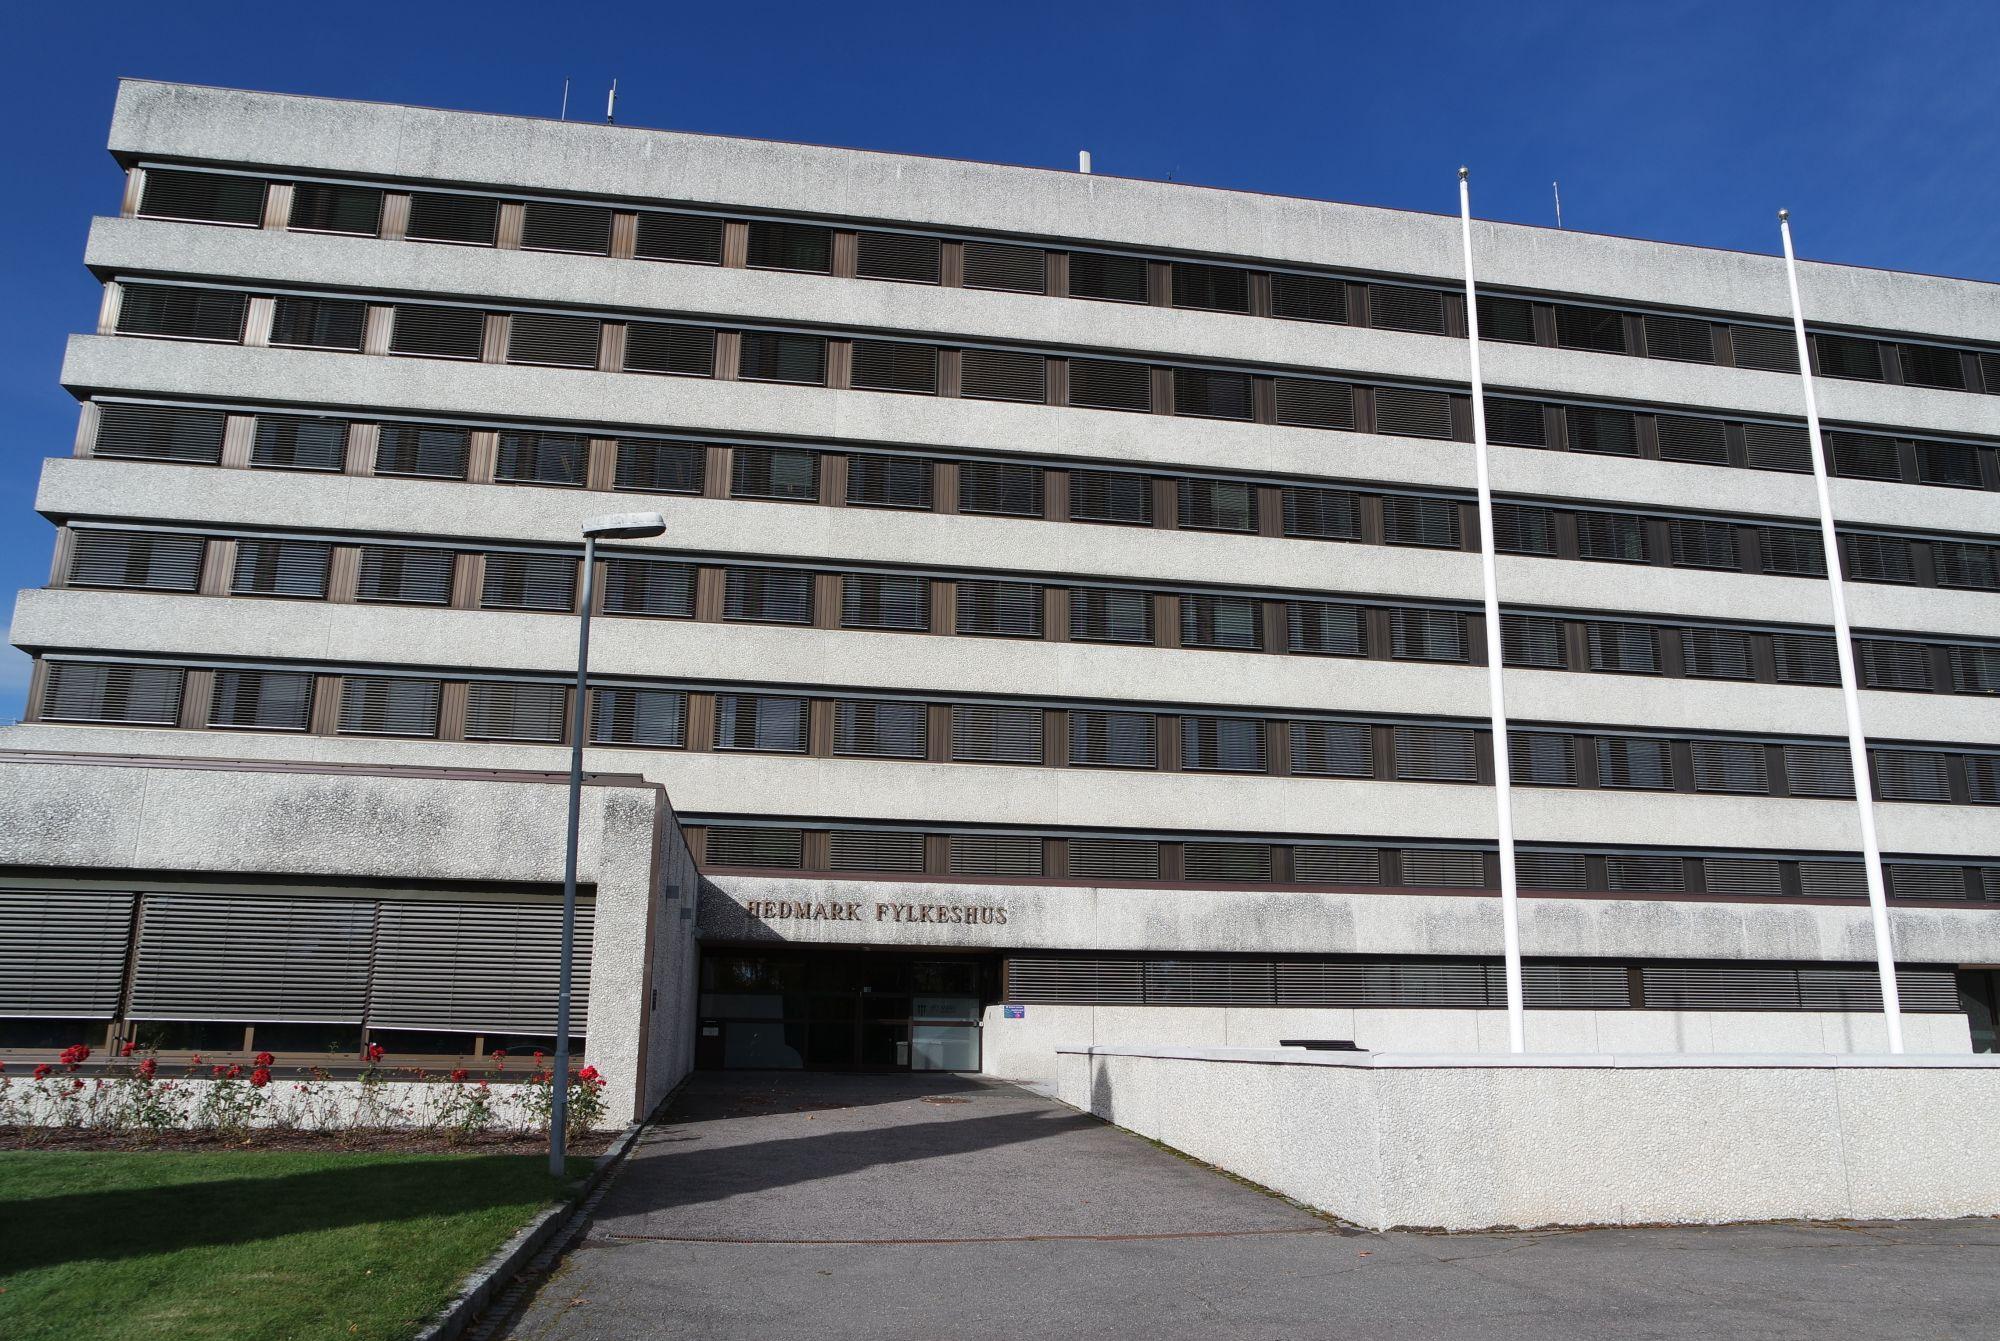 Hedmark fylkeshus i Hamar. Foto: Mona Stormoen